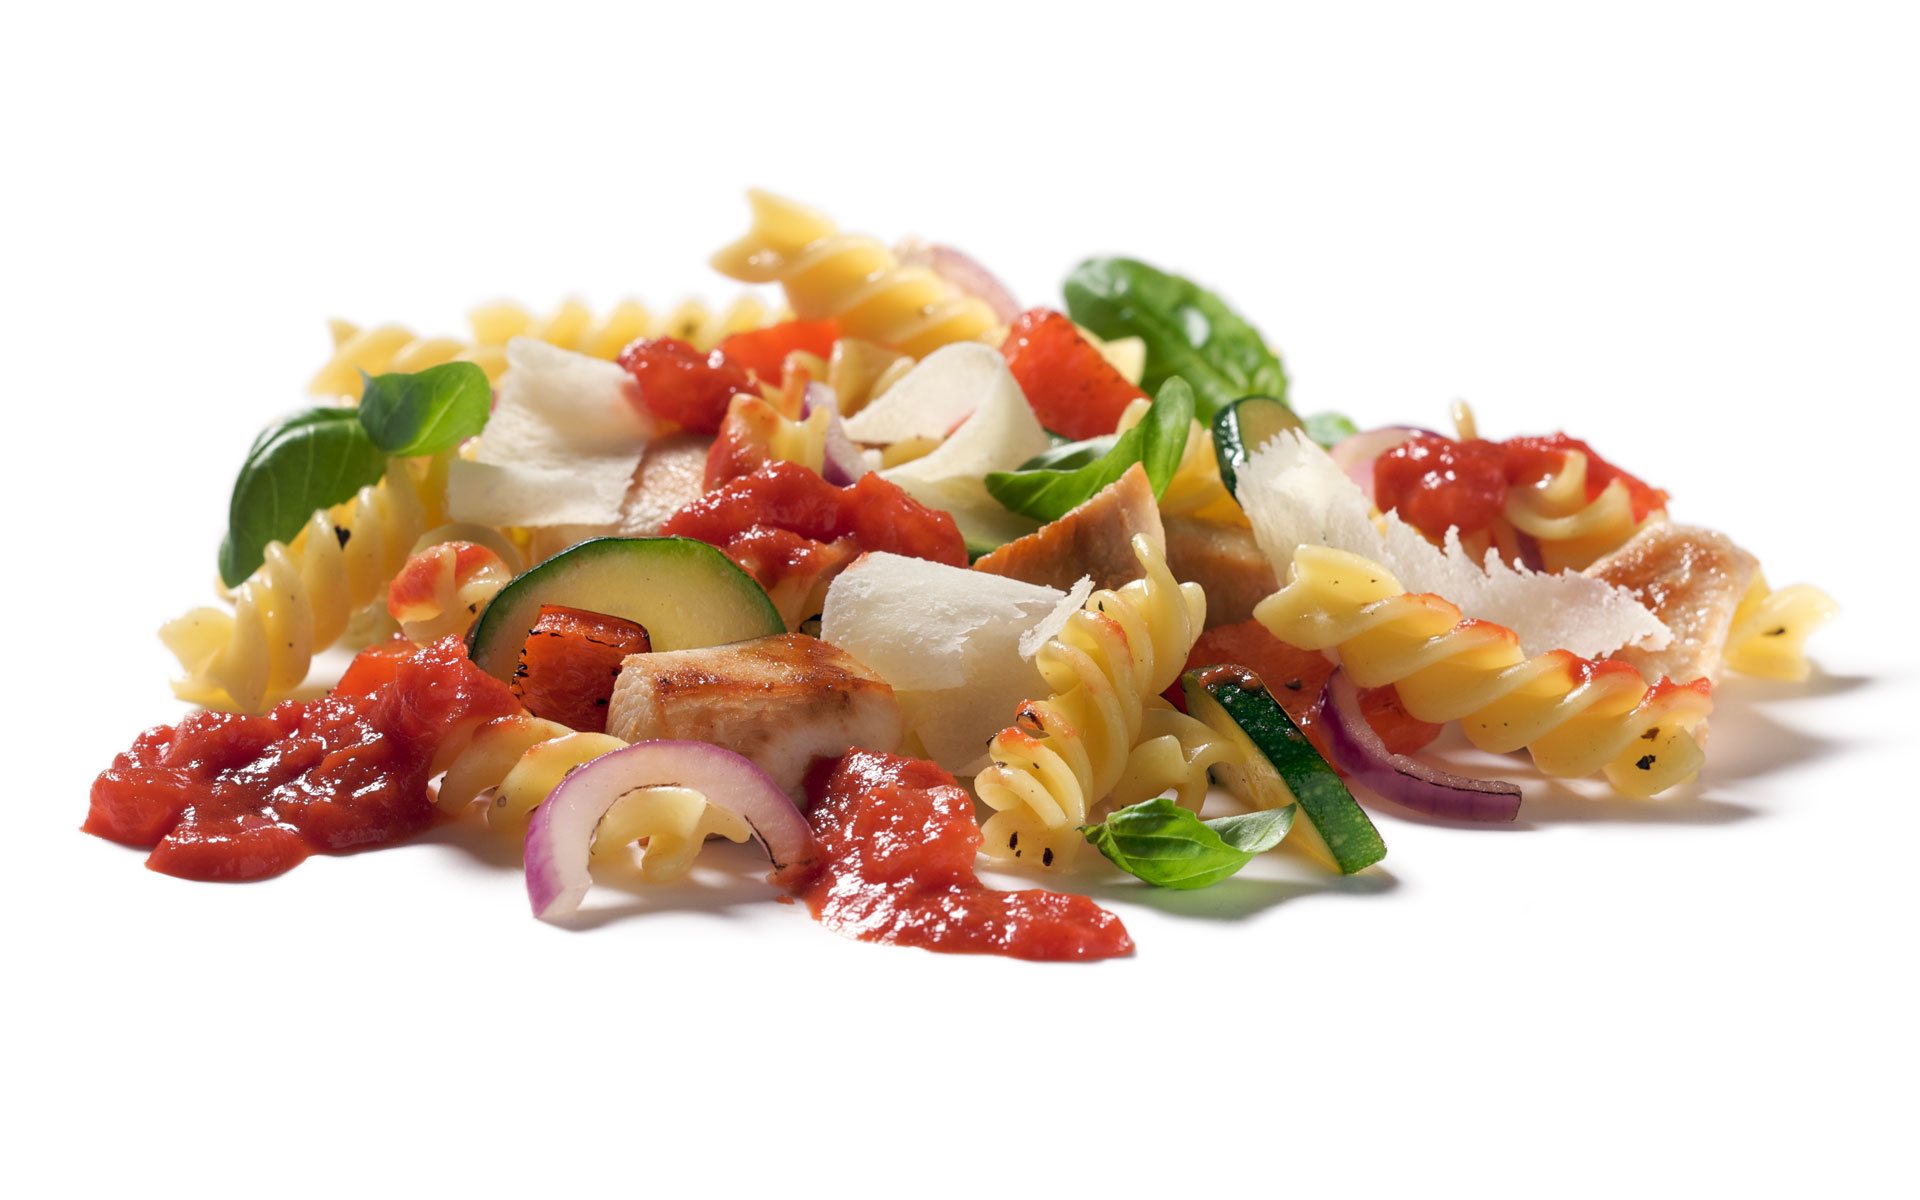 youcook Brand Identity, Food Photography, Pasta alla Valentina